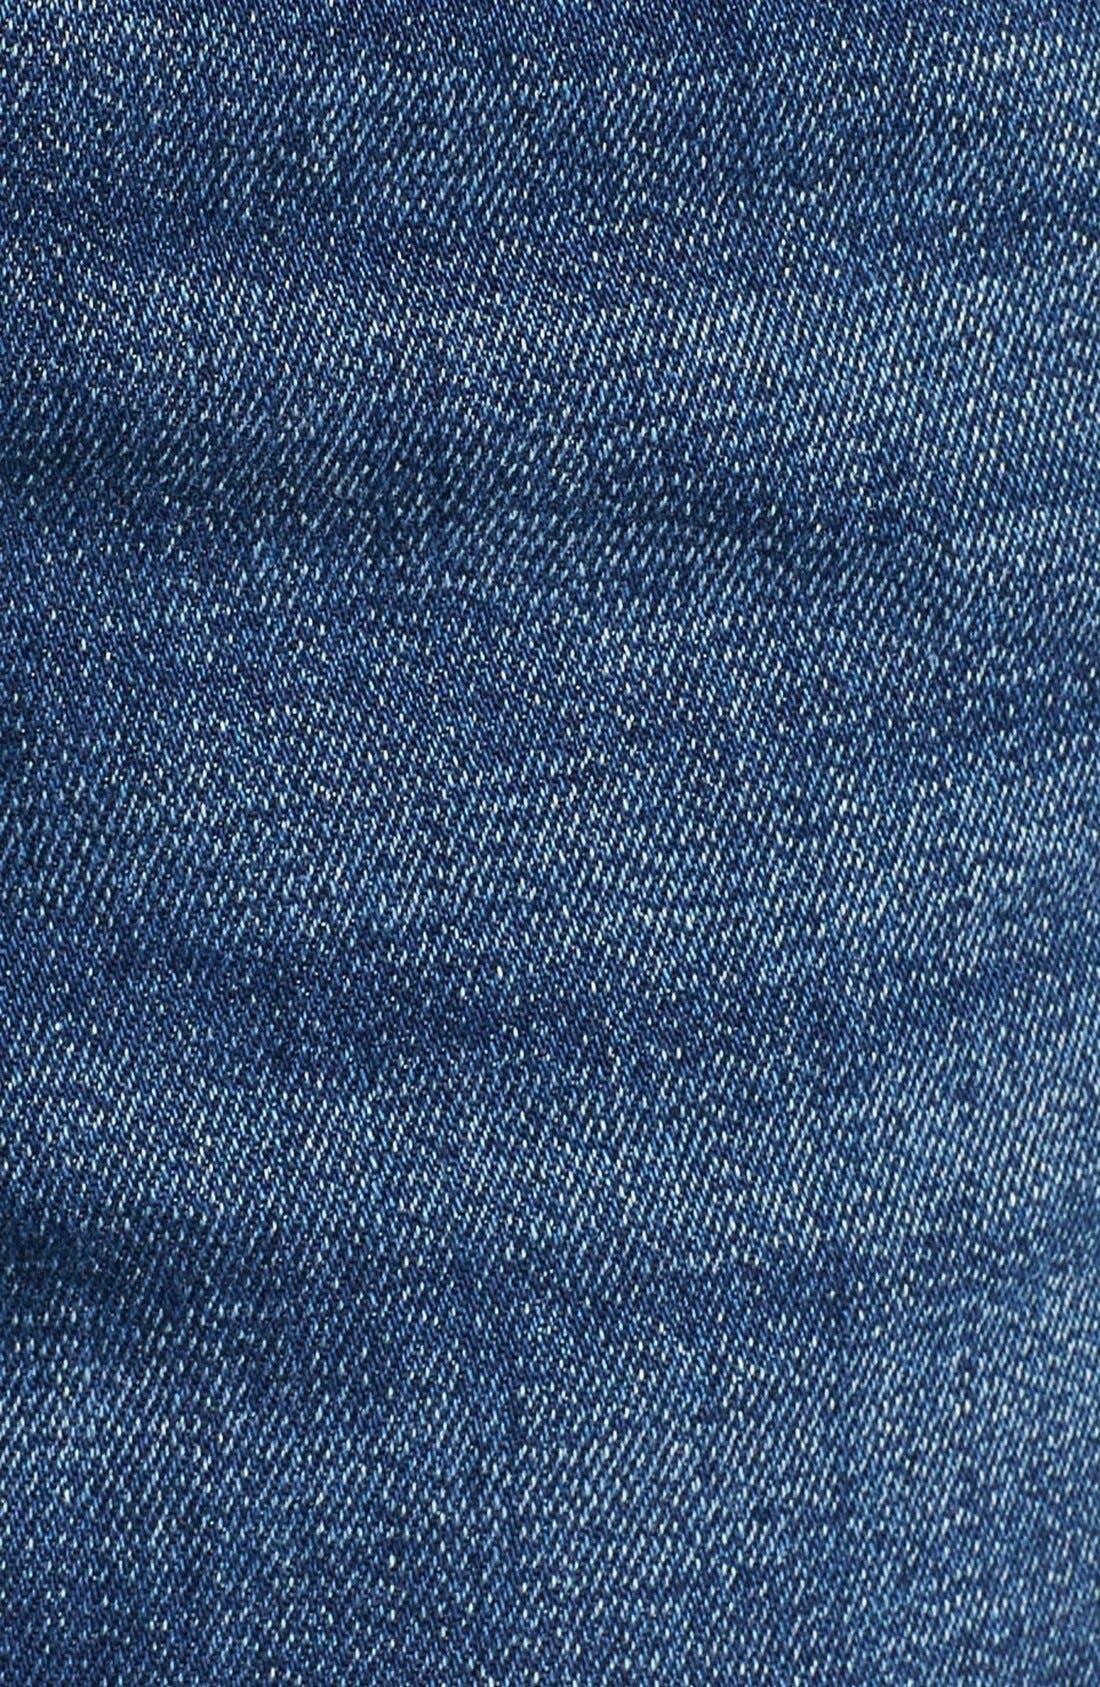 'Highly Vibed' Cutoff Denim Shorts,                             Alternate thumbnail 5, color,                             400